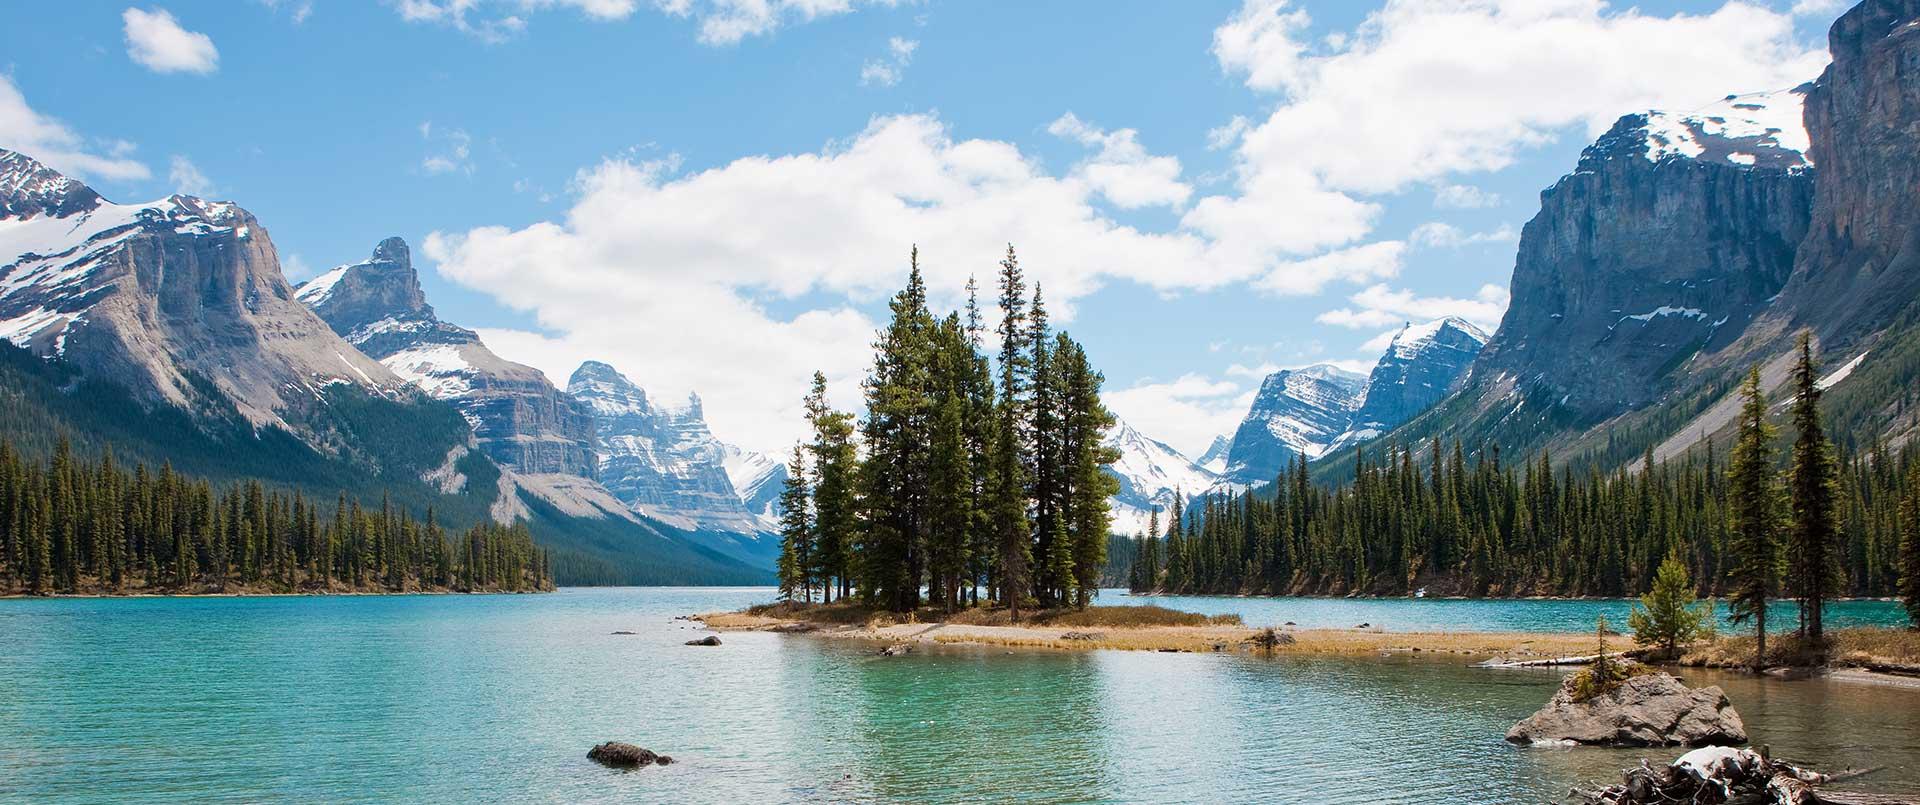 Canada Self Drive - Vancouver to Calgary